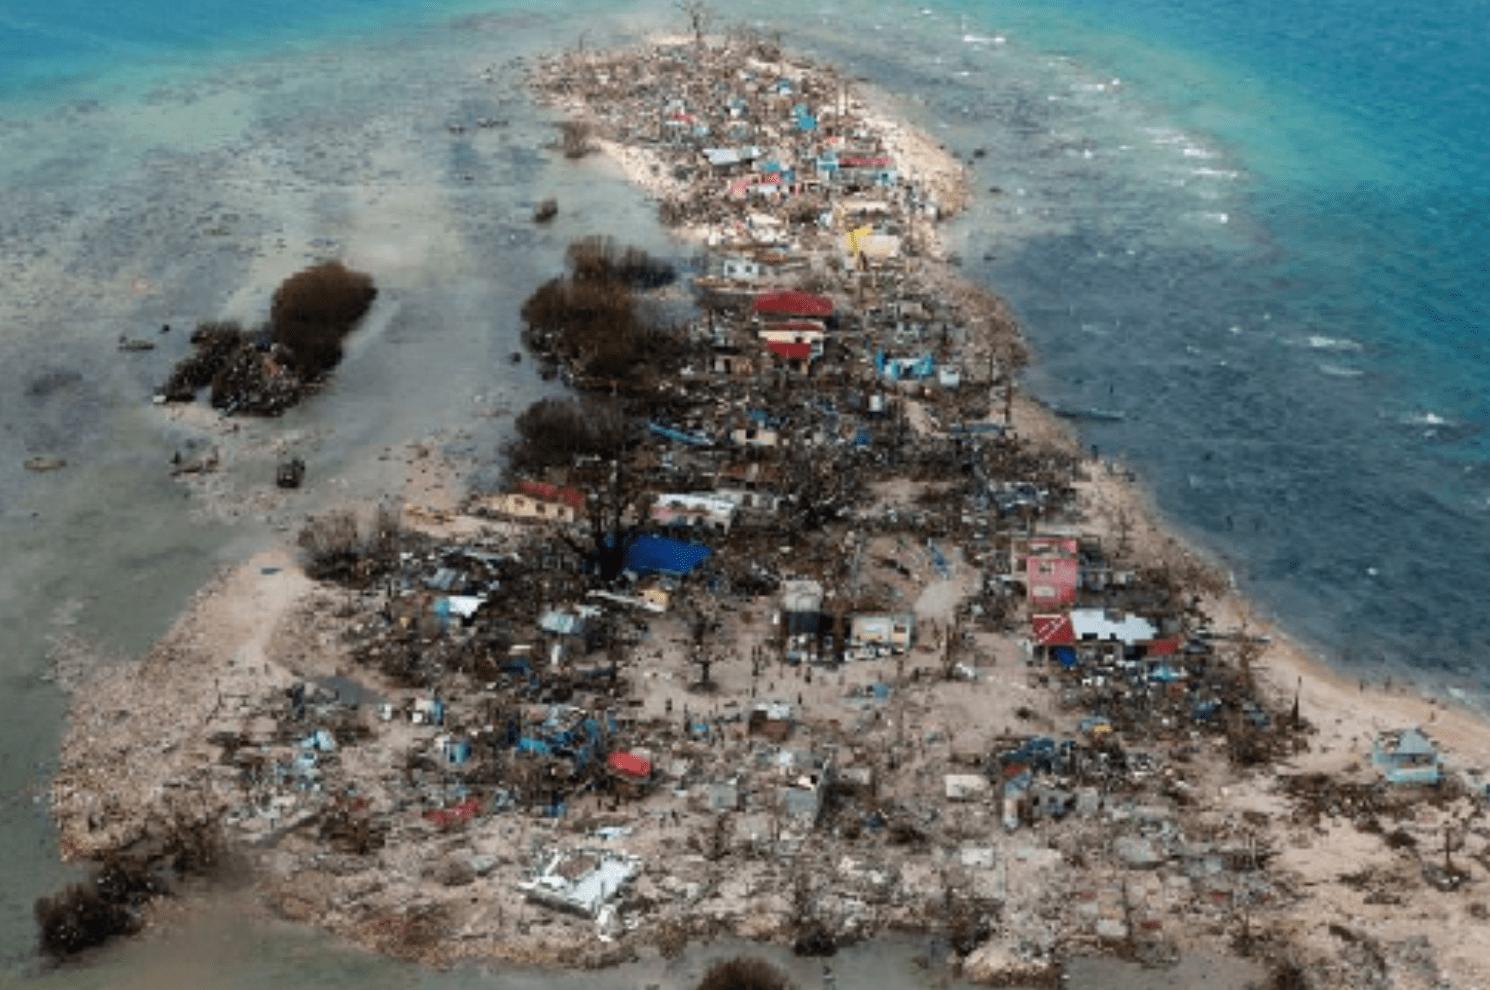 devastation of tacloban Philippines from Typhoon Yolanda